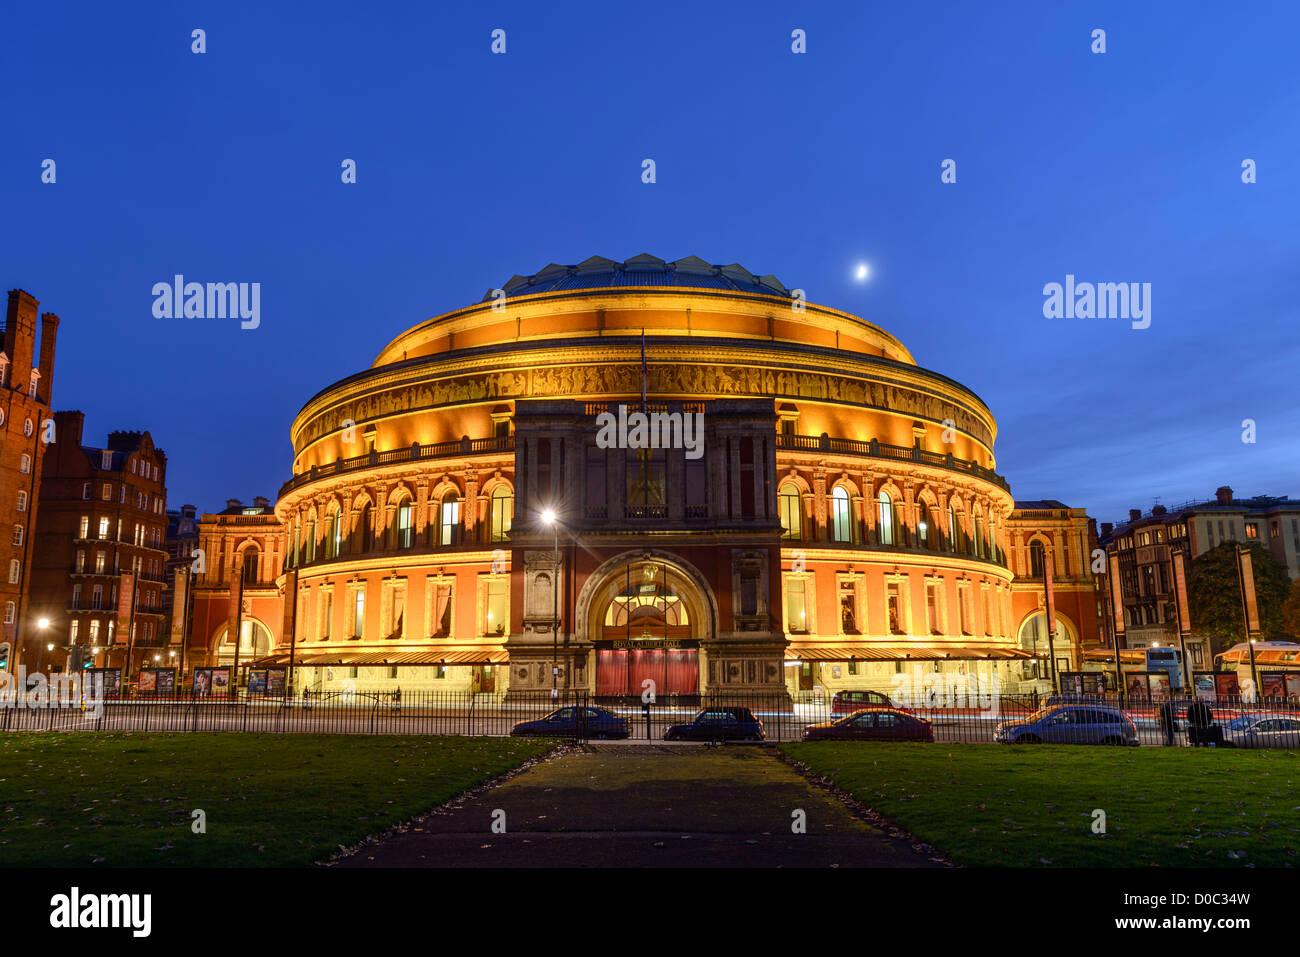 Royal Albert Hall,Kensington,London - Stock Image